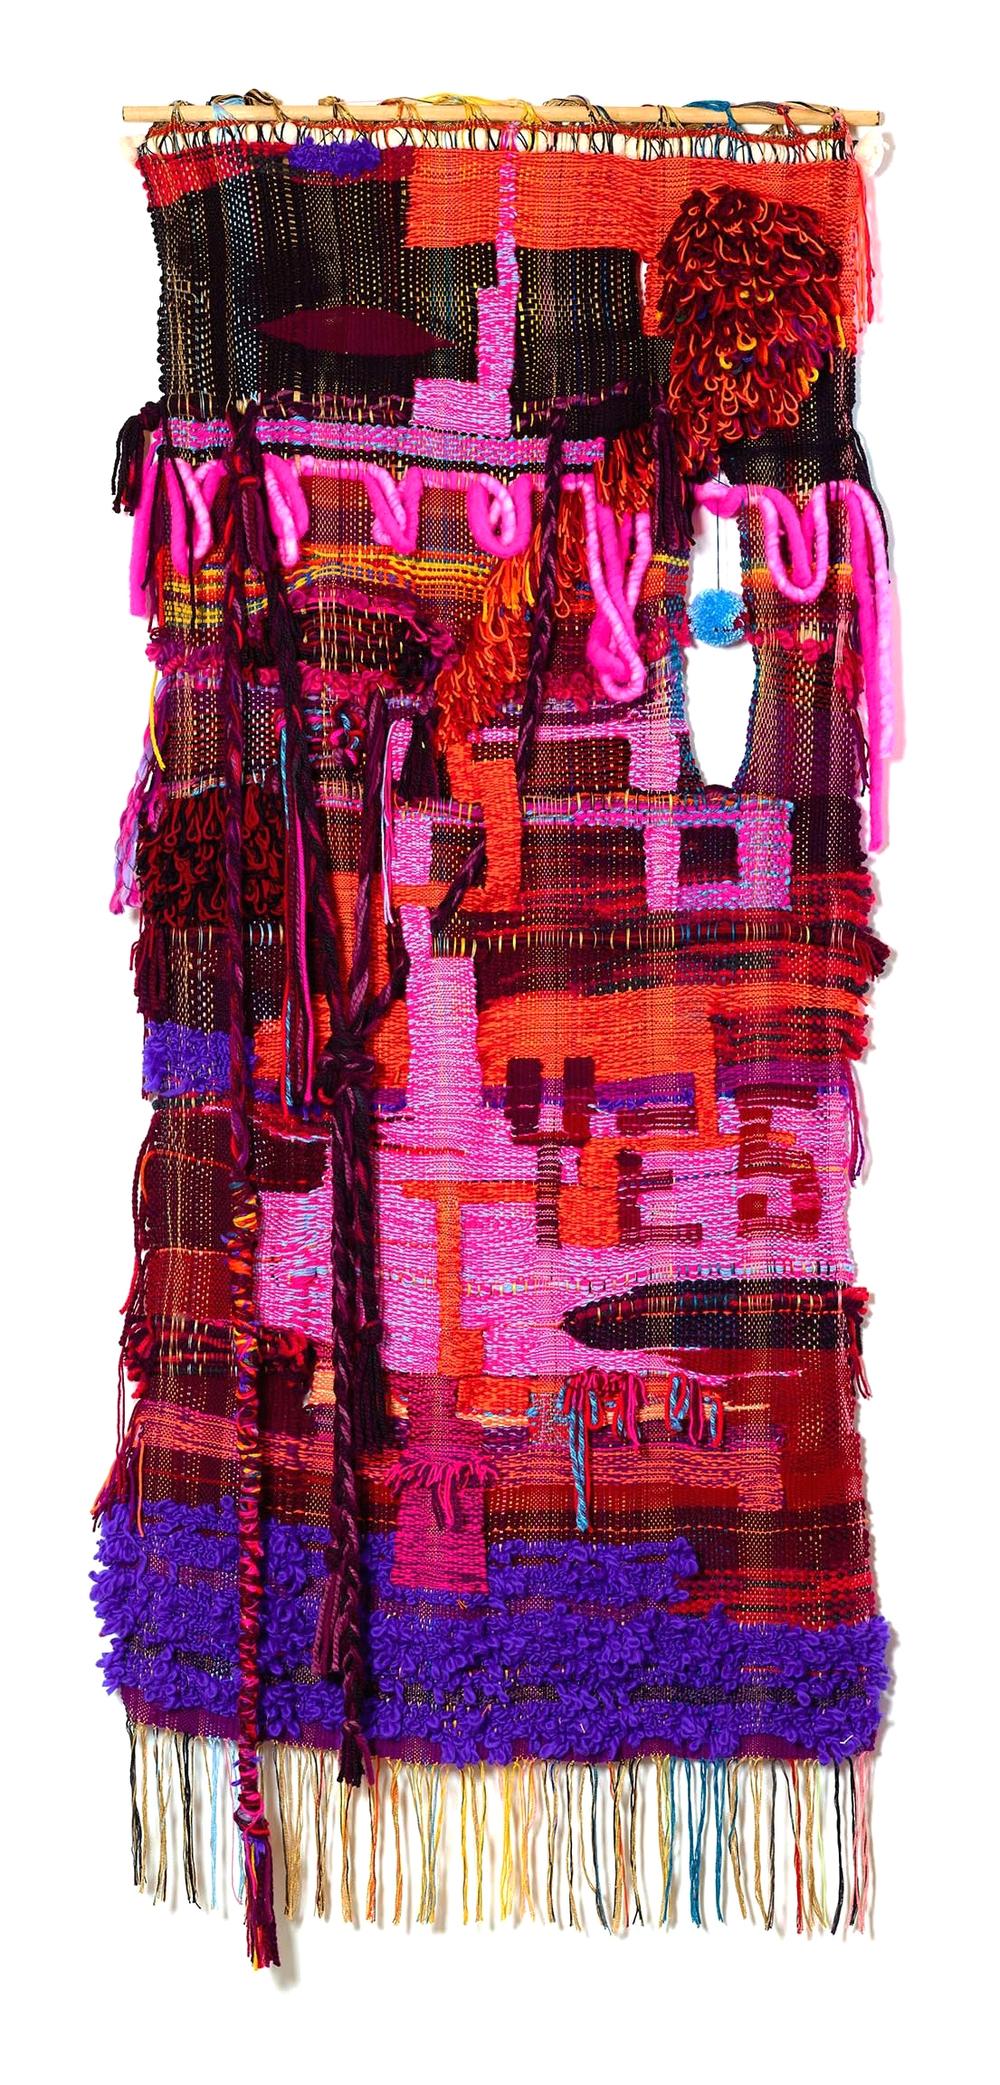 "2015, 86"" x 37"", acrylic, wool, cotton"